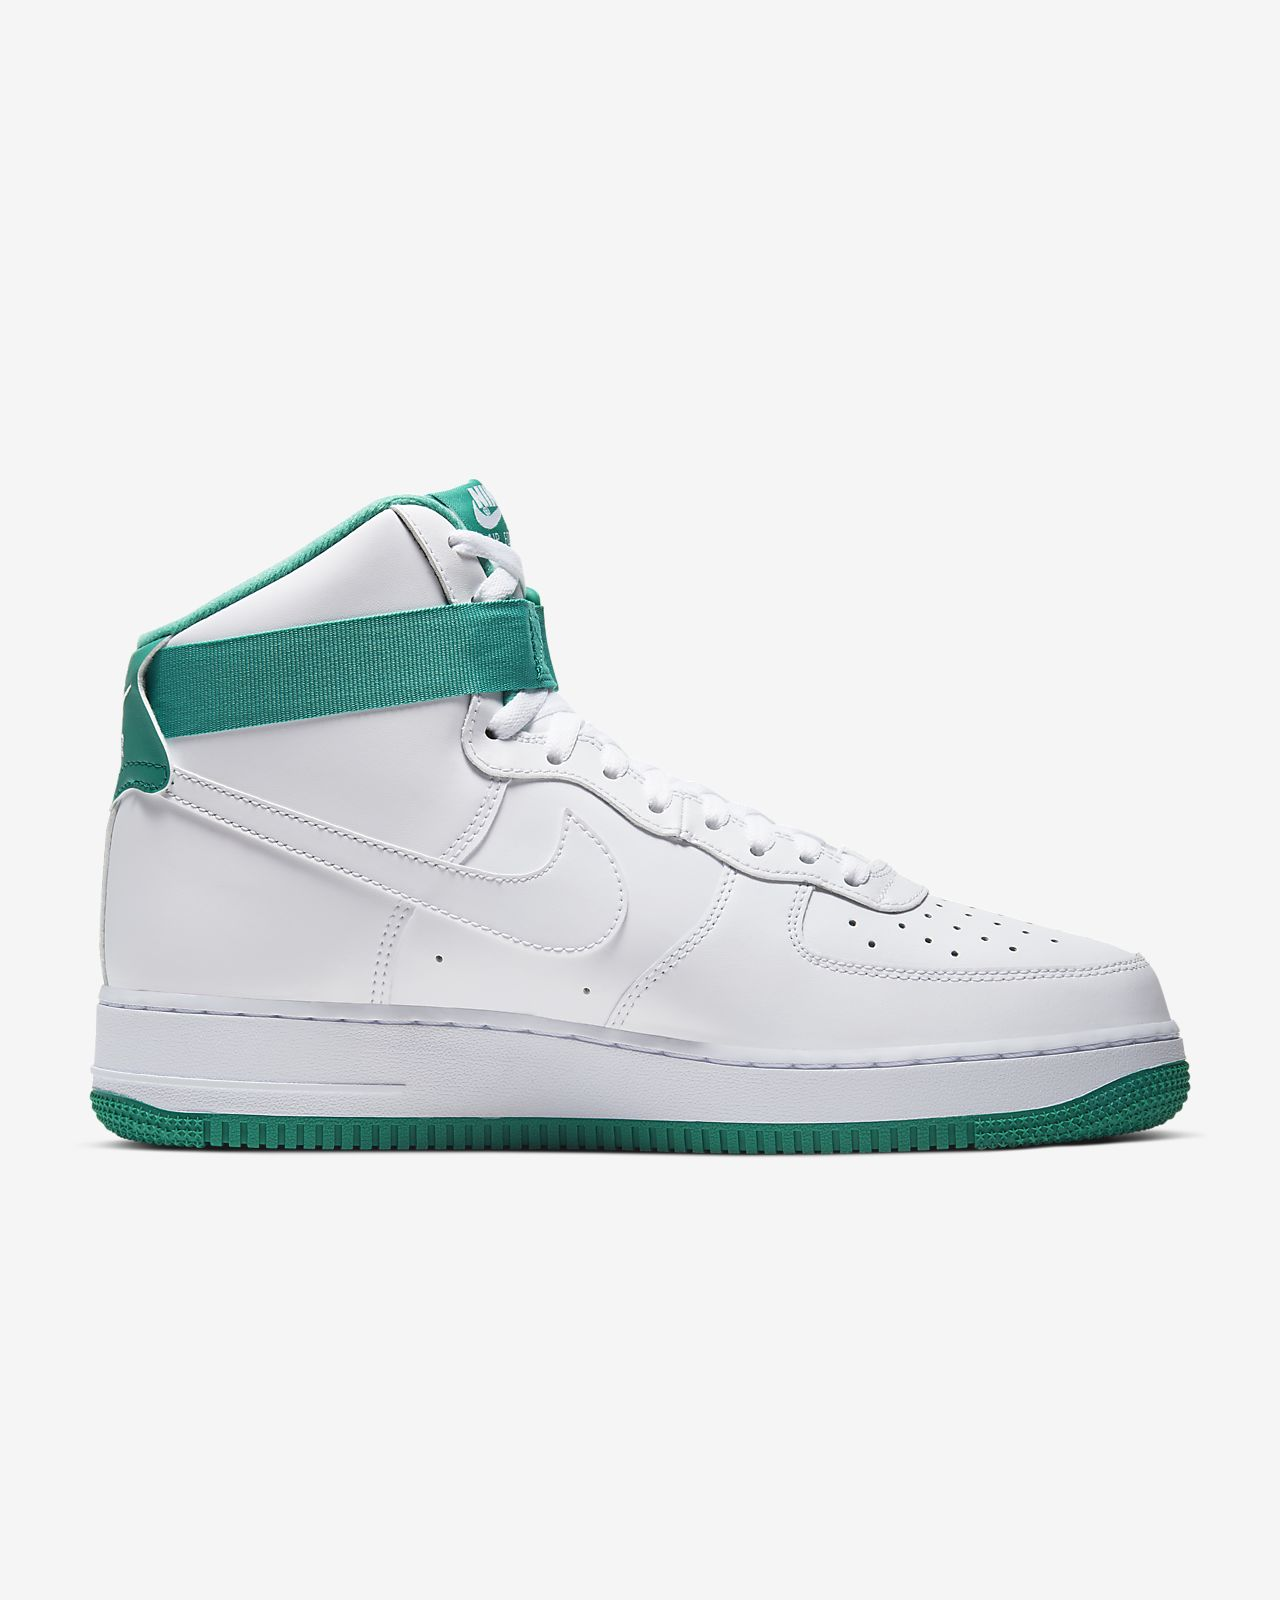 Nike: Air Force 1 'Hong Kong' [GreenWhite] – Social Status